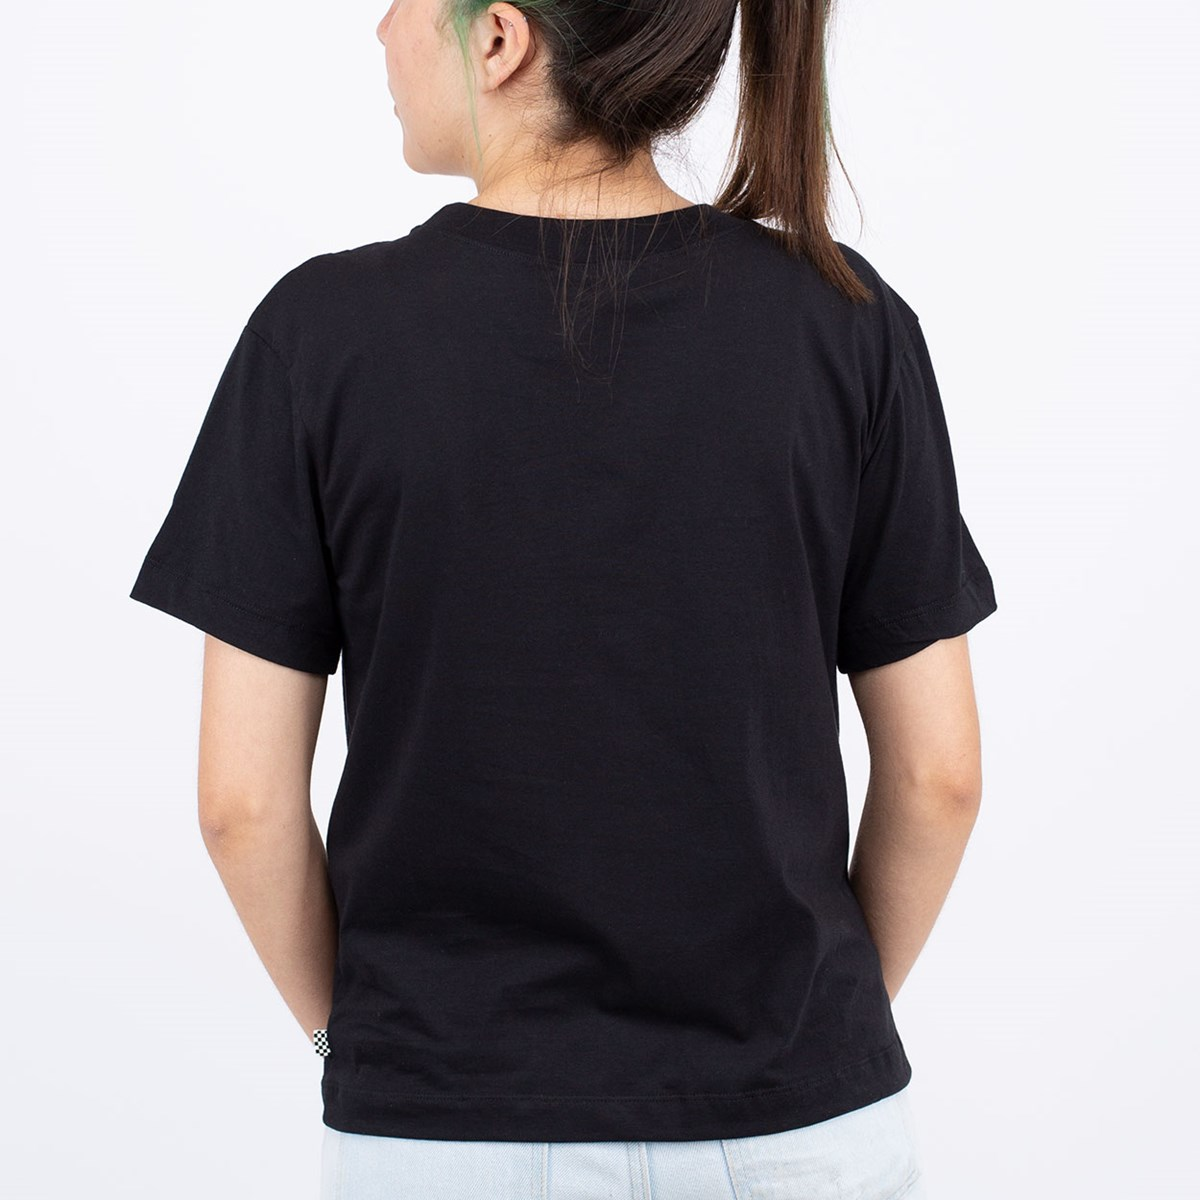 Camiseta Vans Junior V Boxy Black VN0A4MFLBLK